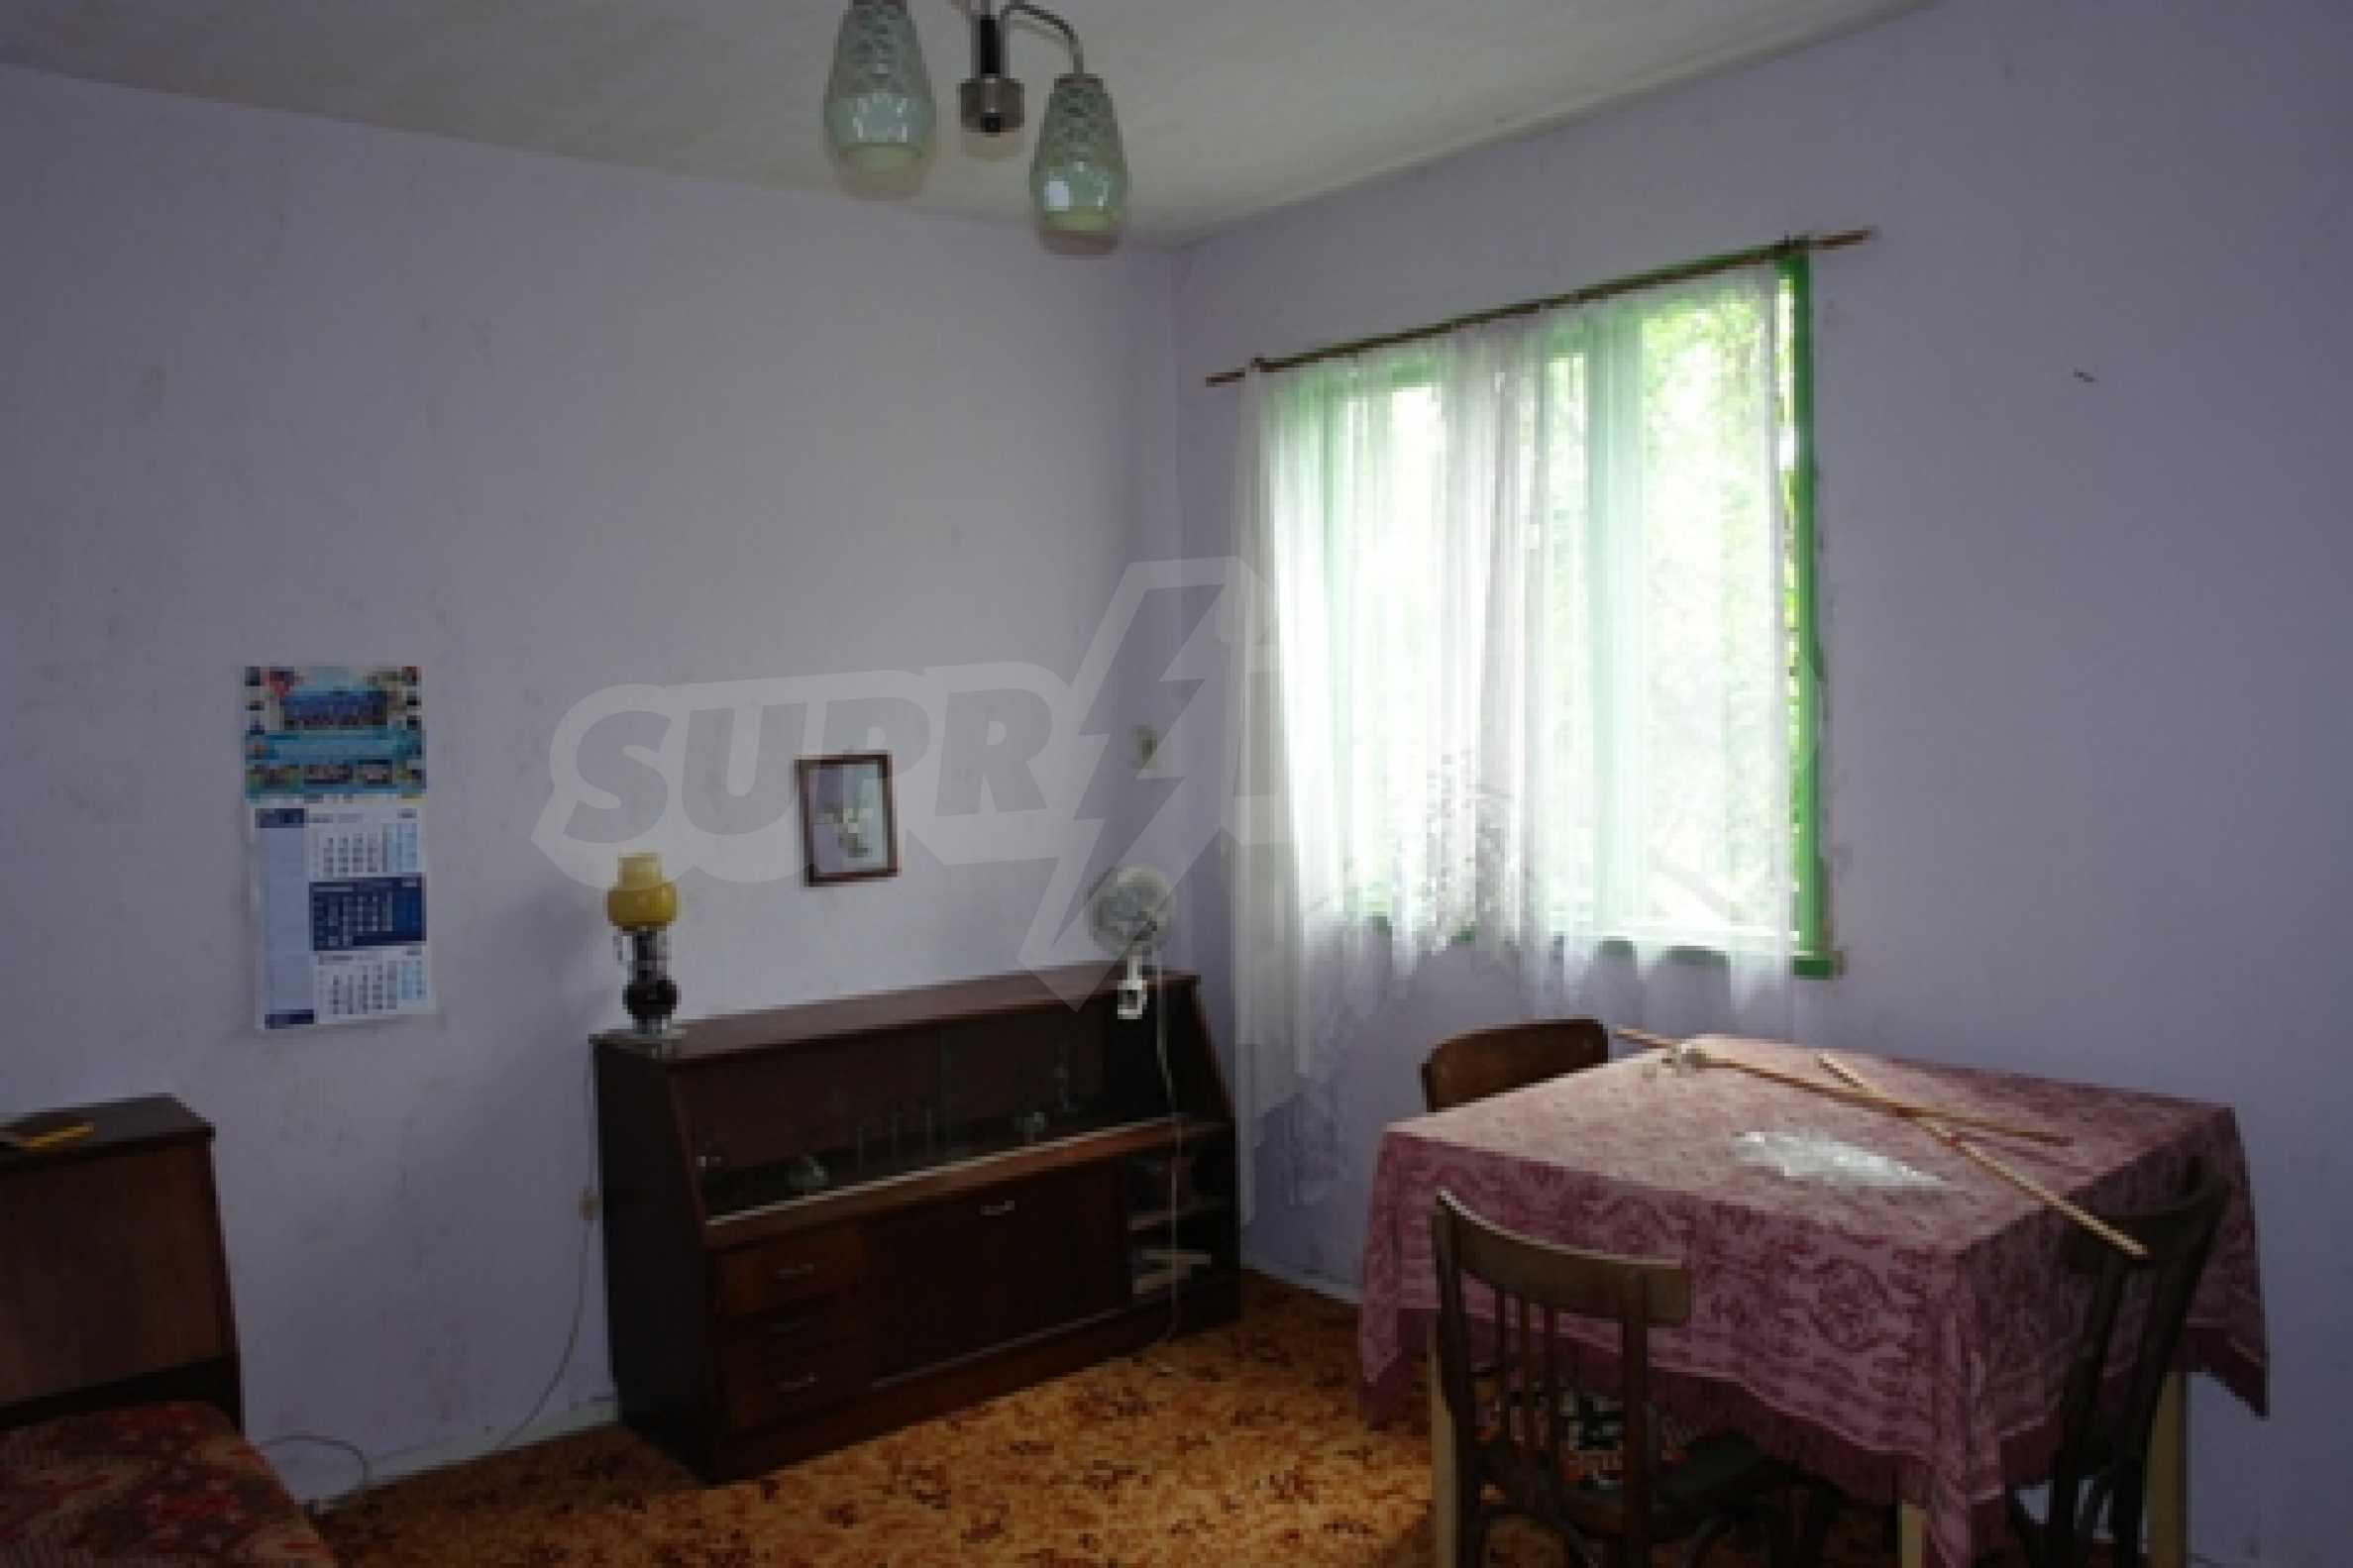 Spacious two-storey 4-bedroom house in Trastenik village, Ruse district 10